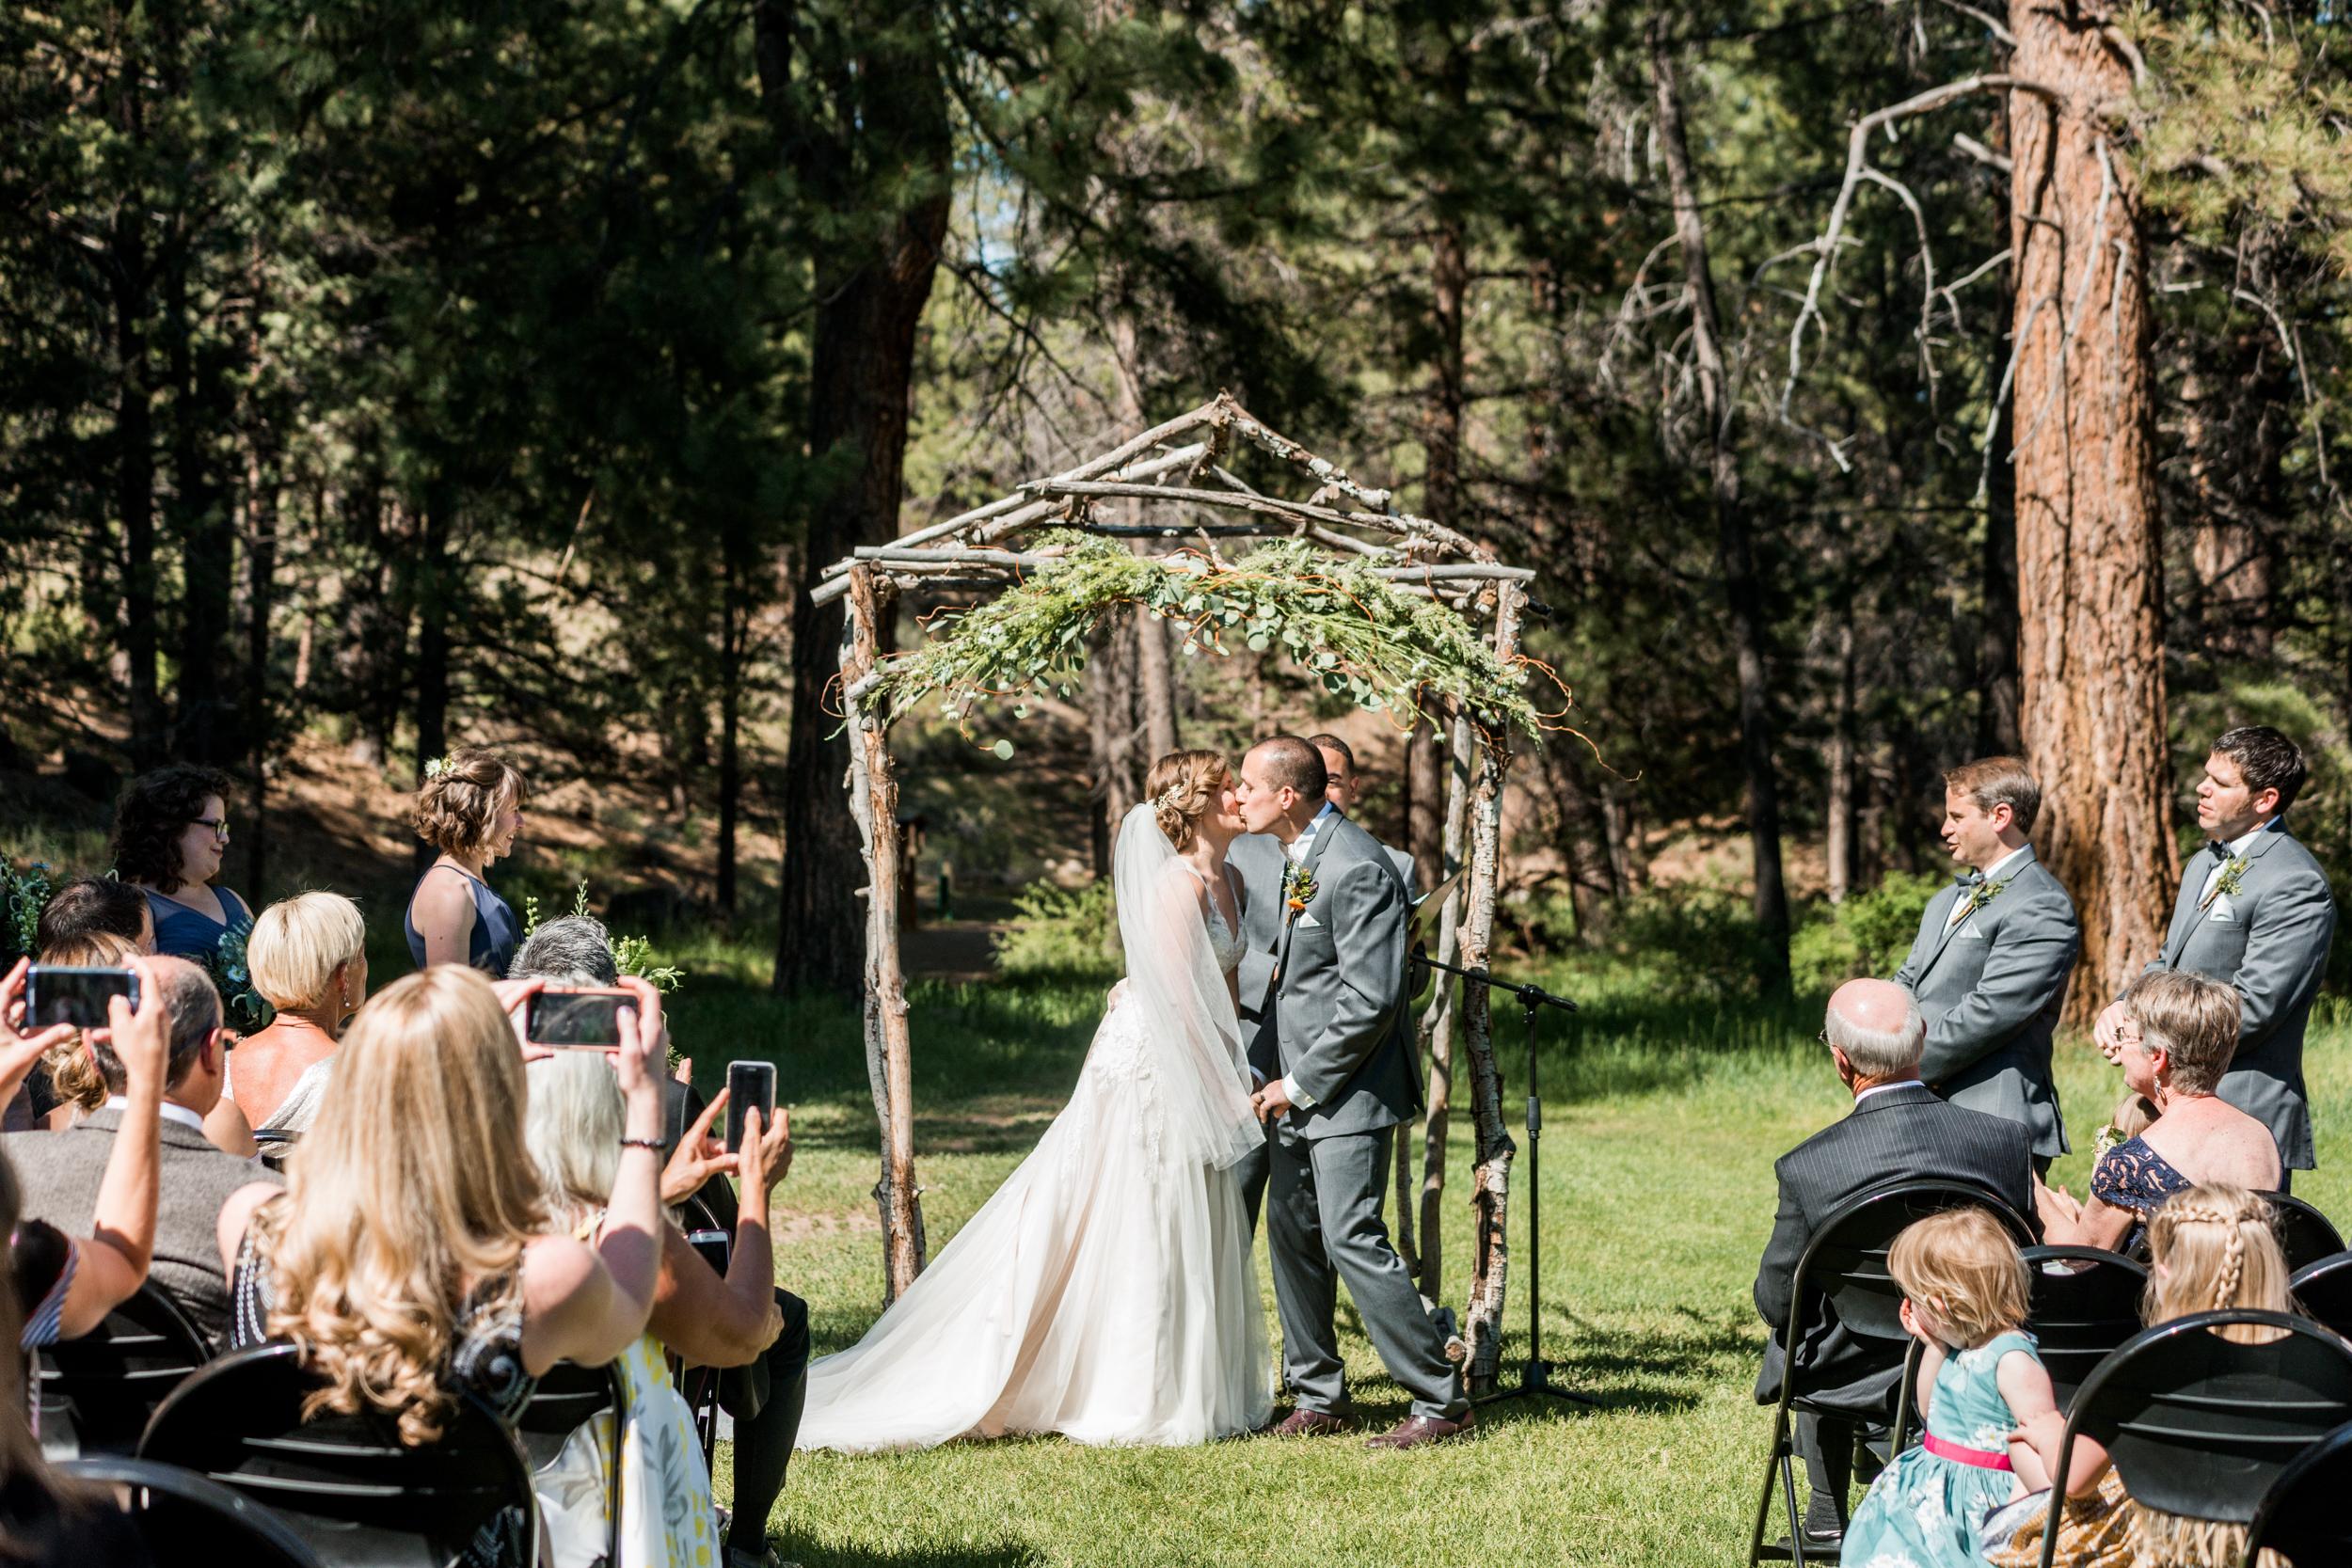 bend_wedding_photographer_81.jpg